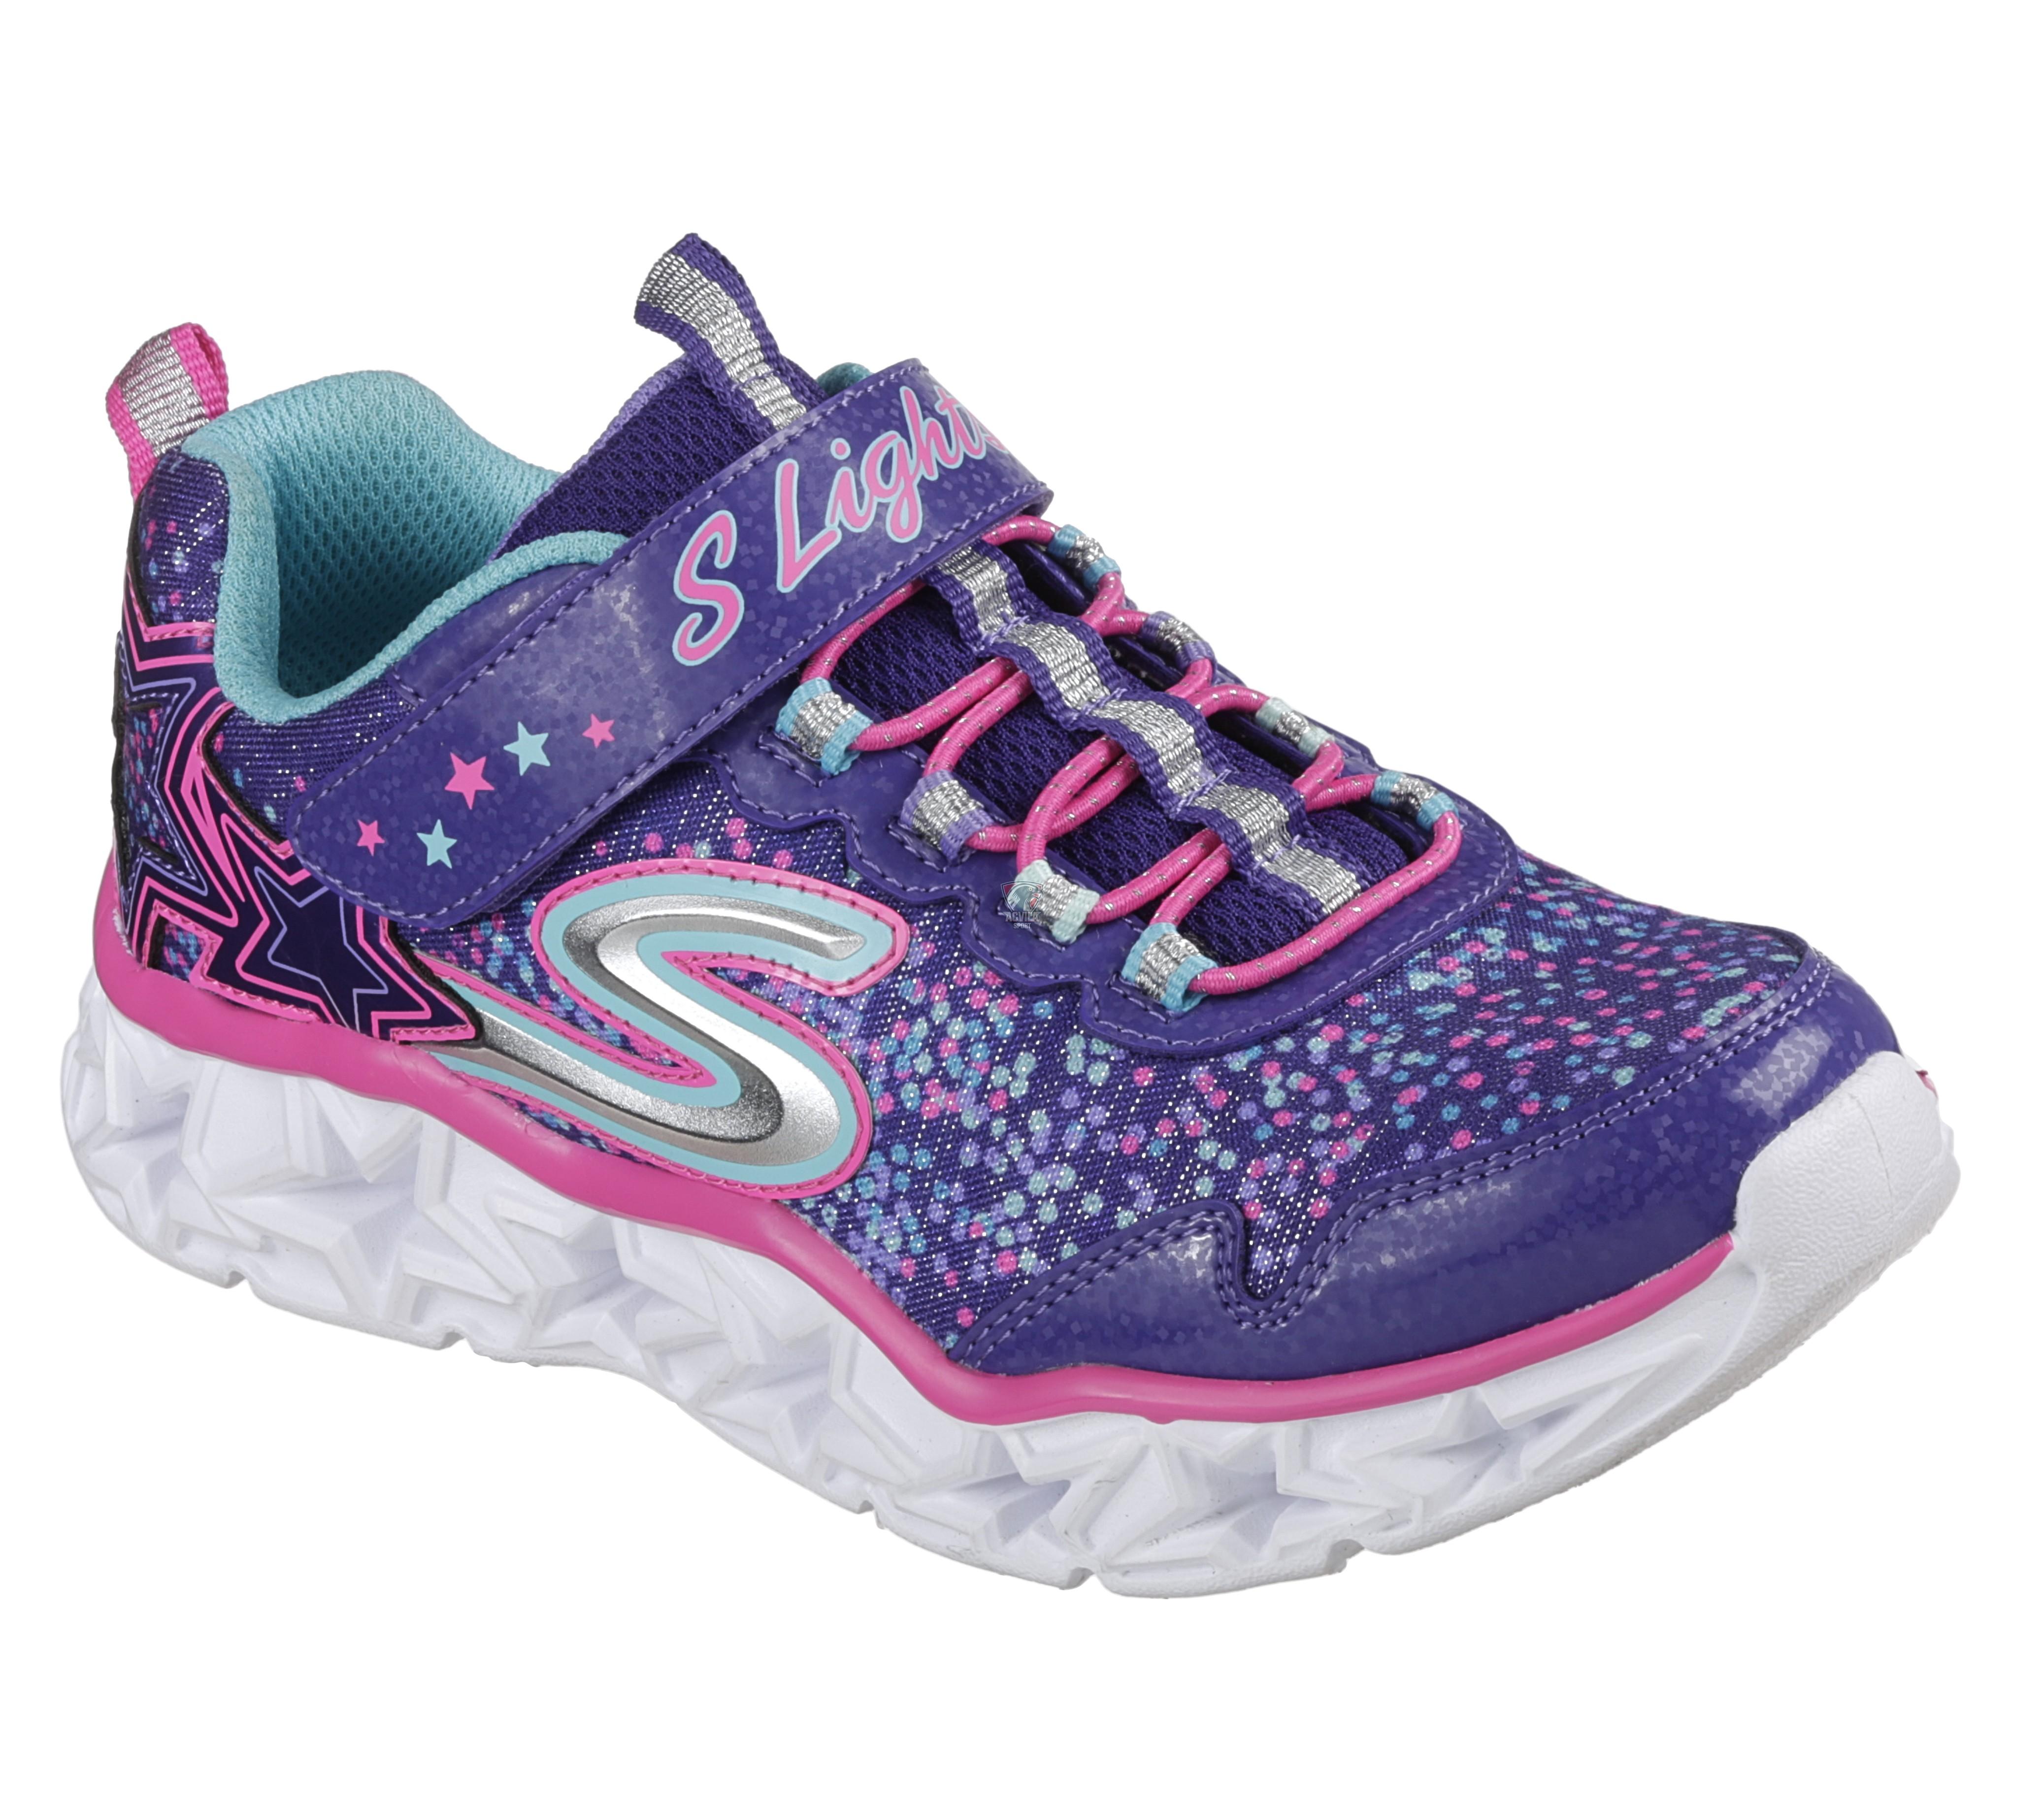 photo 6 Детская обувь SKECHERS GALAXY LIGHTS